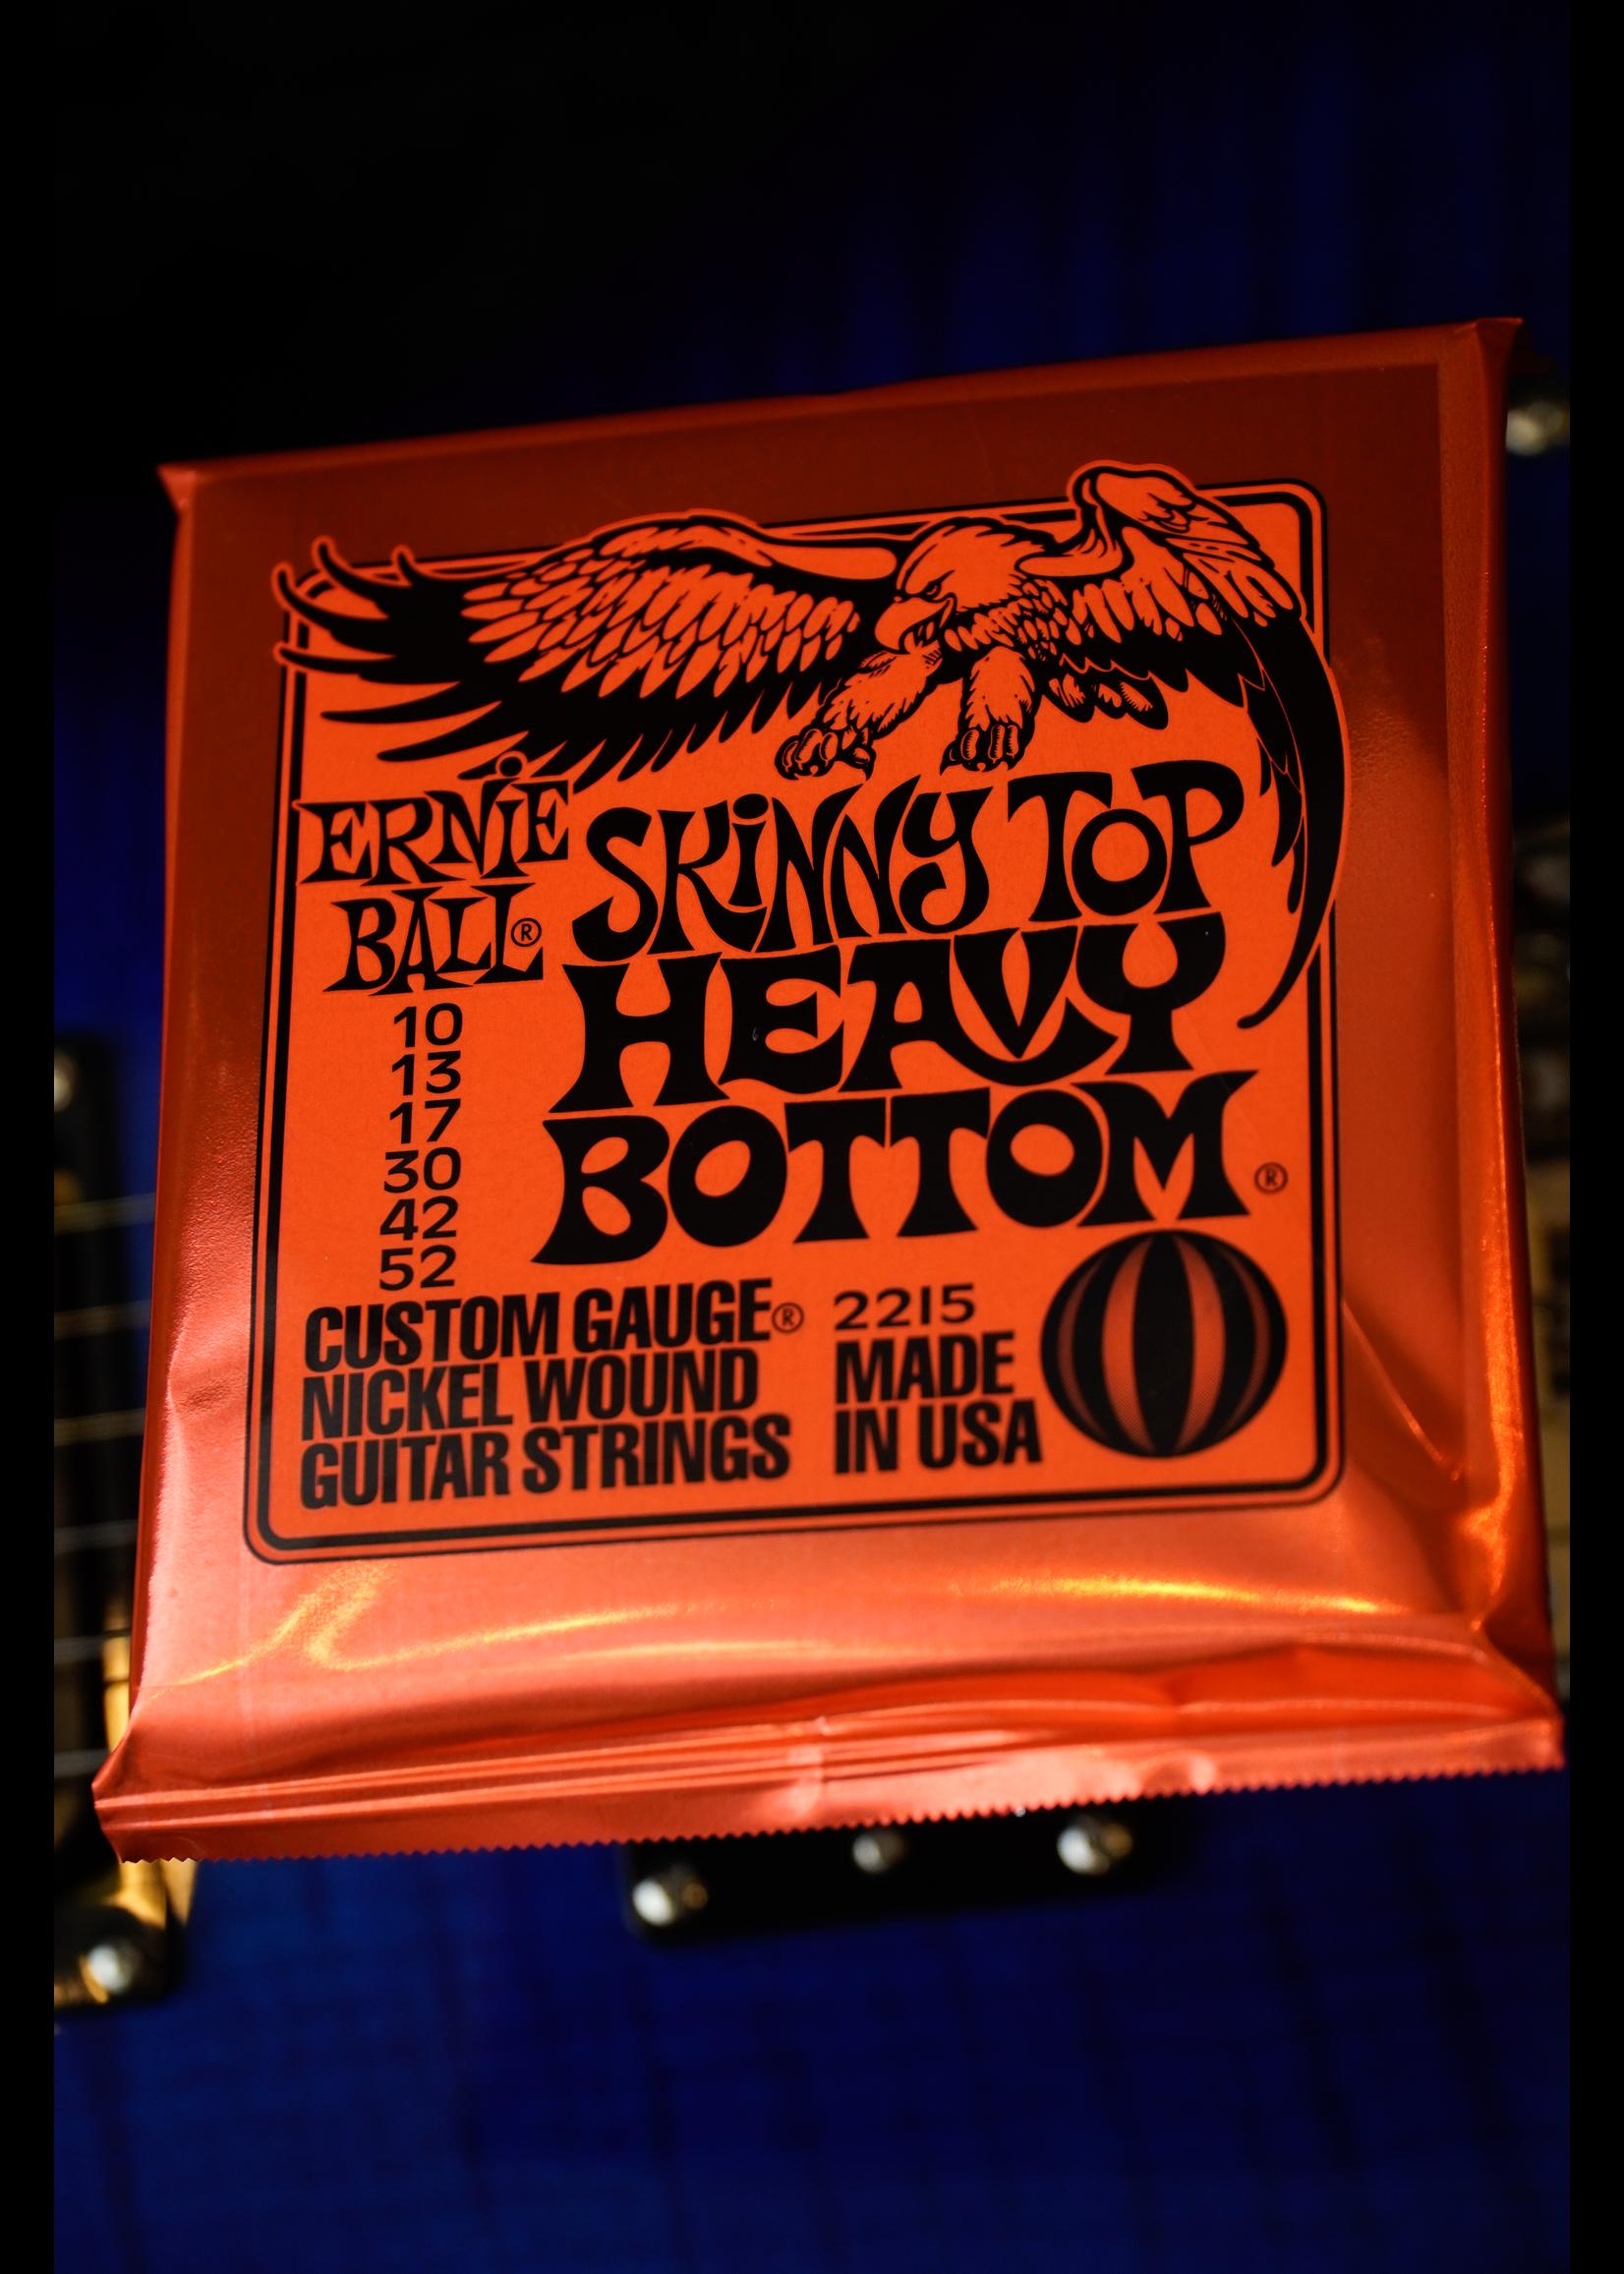 ernie ball Ernie Ball Skinny Top Heavy Bottom Slinky Nickel Wound Electric Guitar Strings - 10-52 Gauge